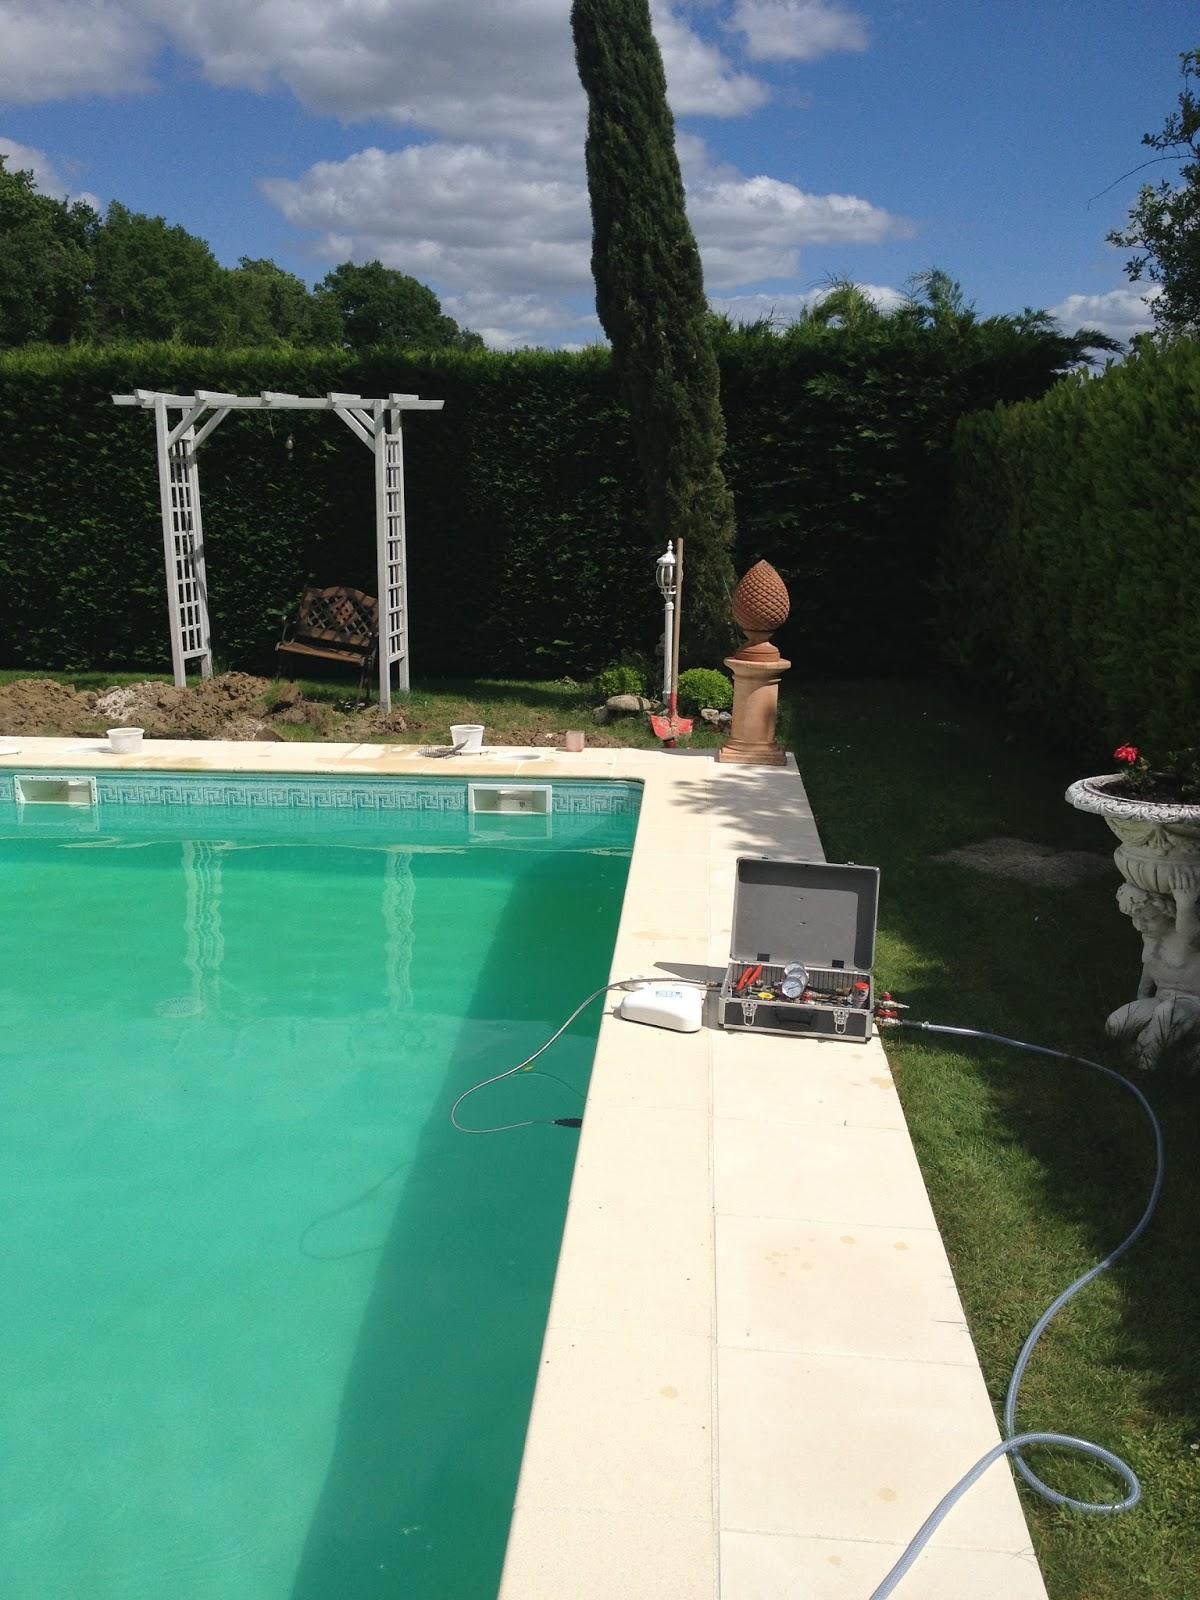 Comment touver ma fuite piscine toulouse for Piscine cornebarrieu